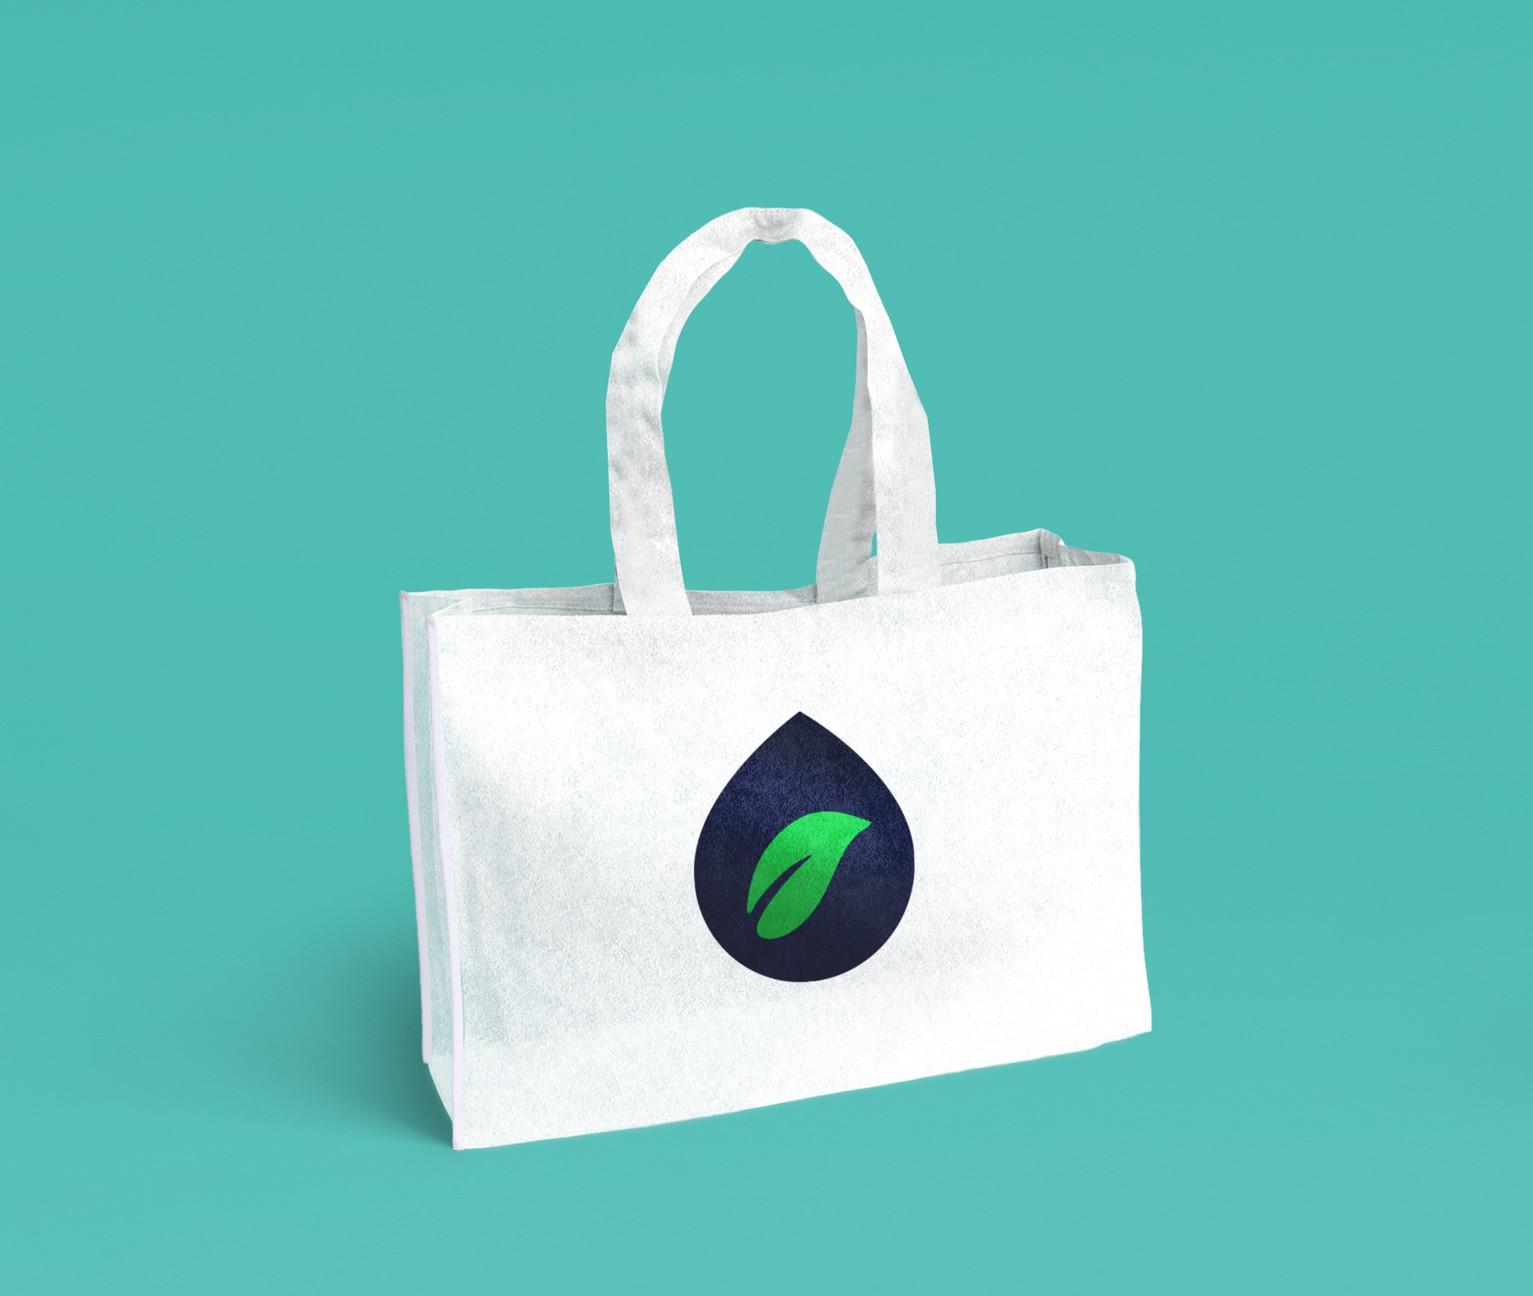 Medium gusset bag